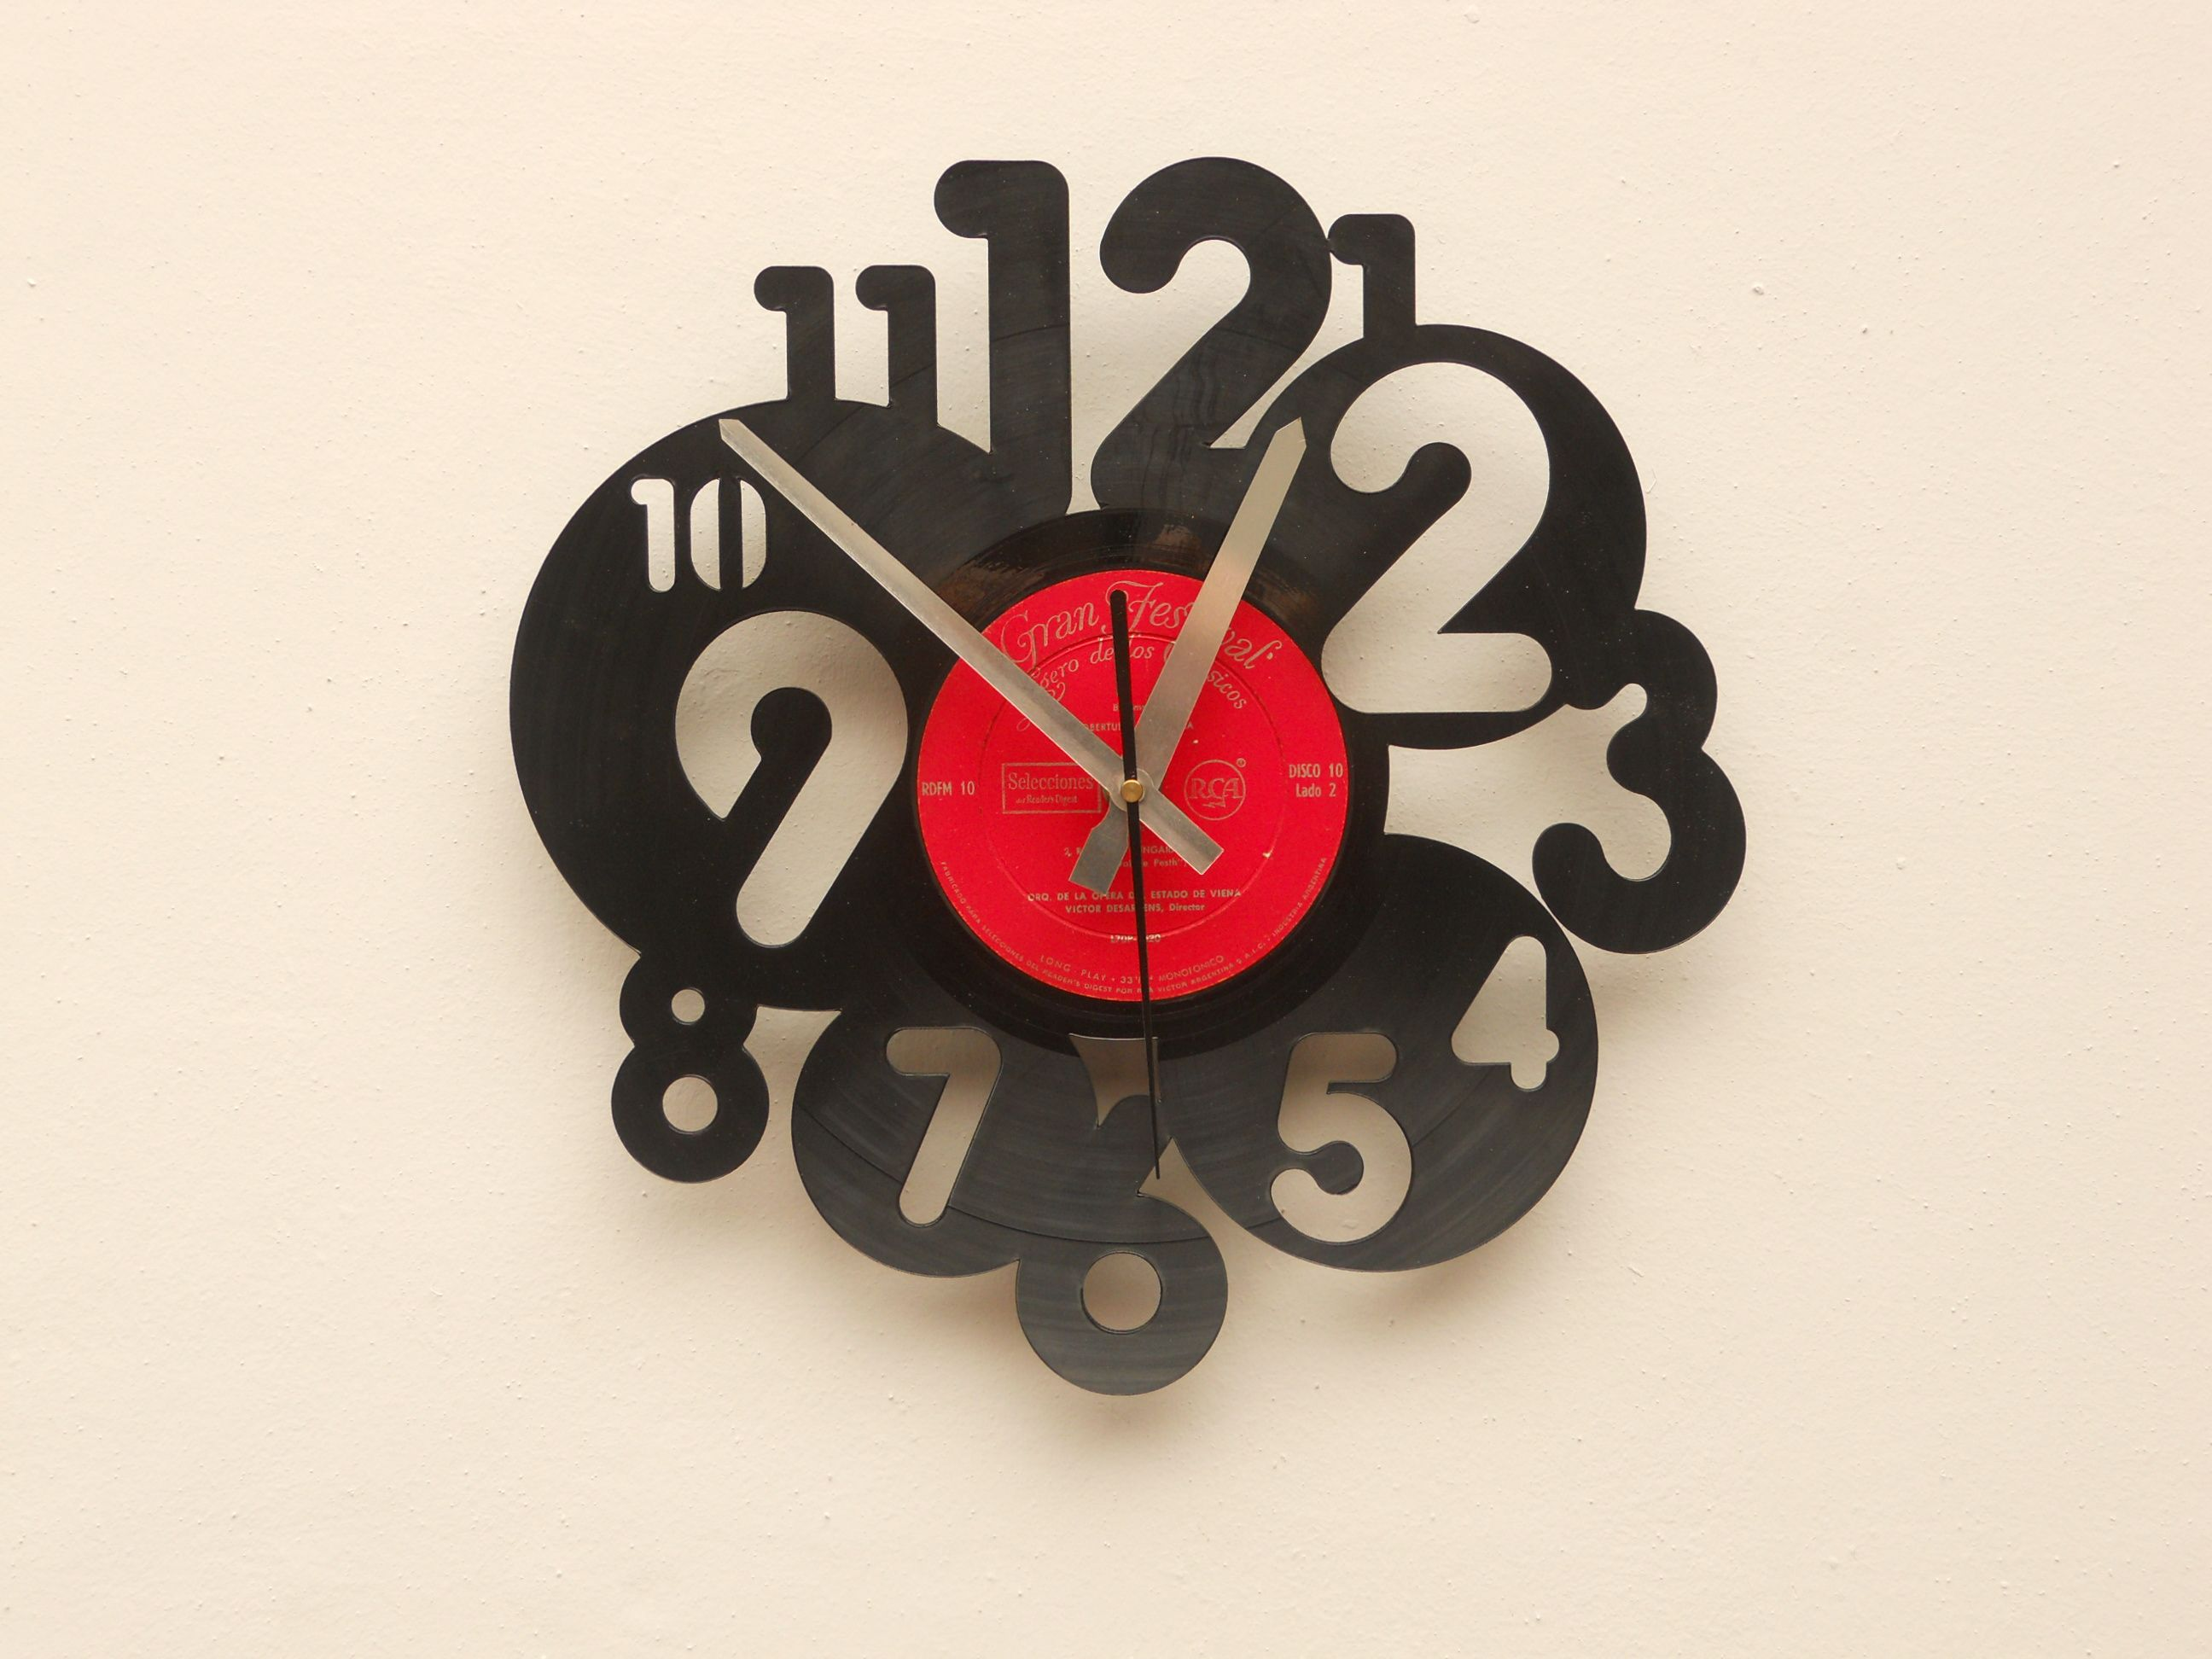 Reloj de pared calado en disco de vinilo laser cutting - Relojes de pared ...